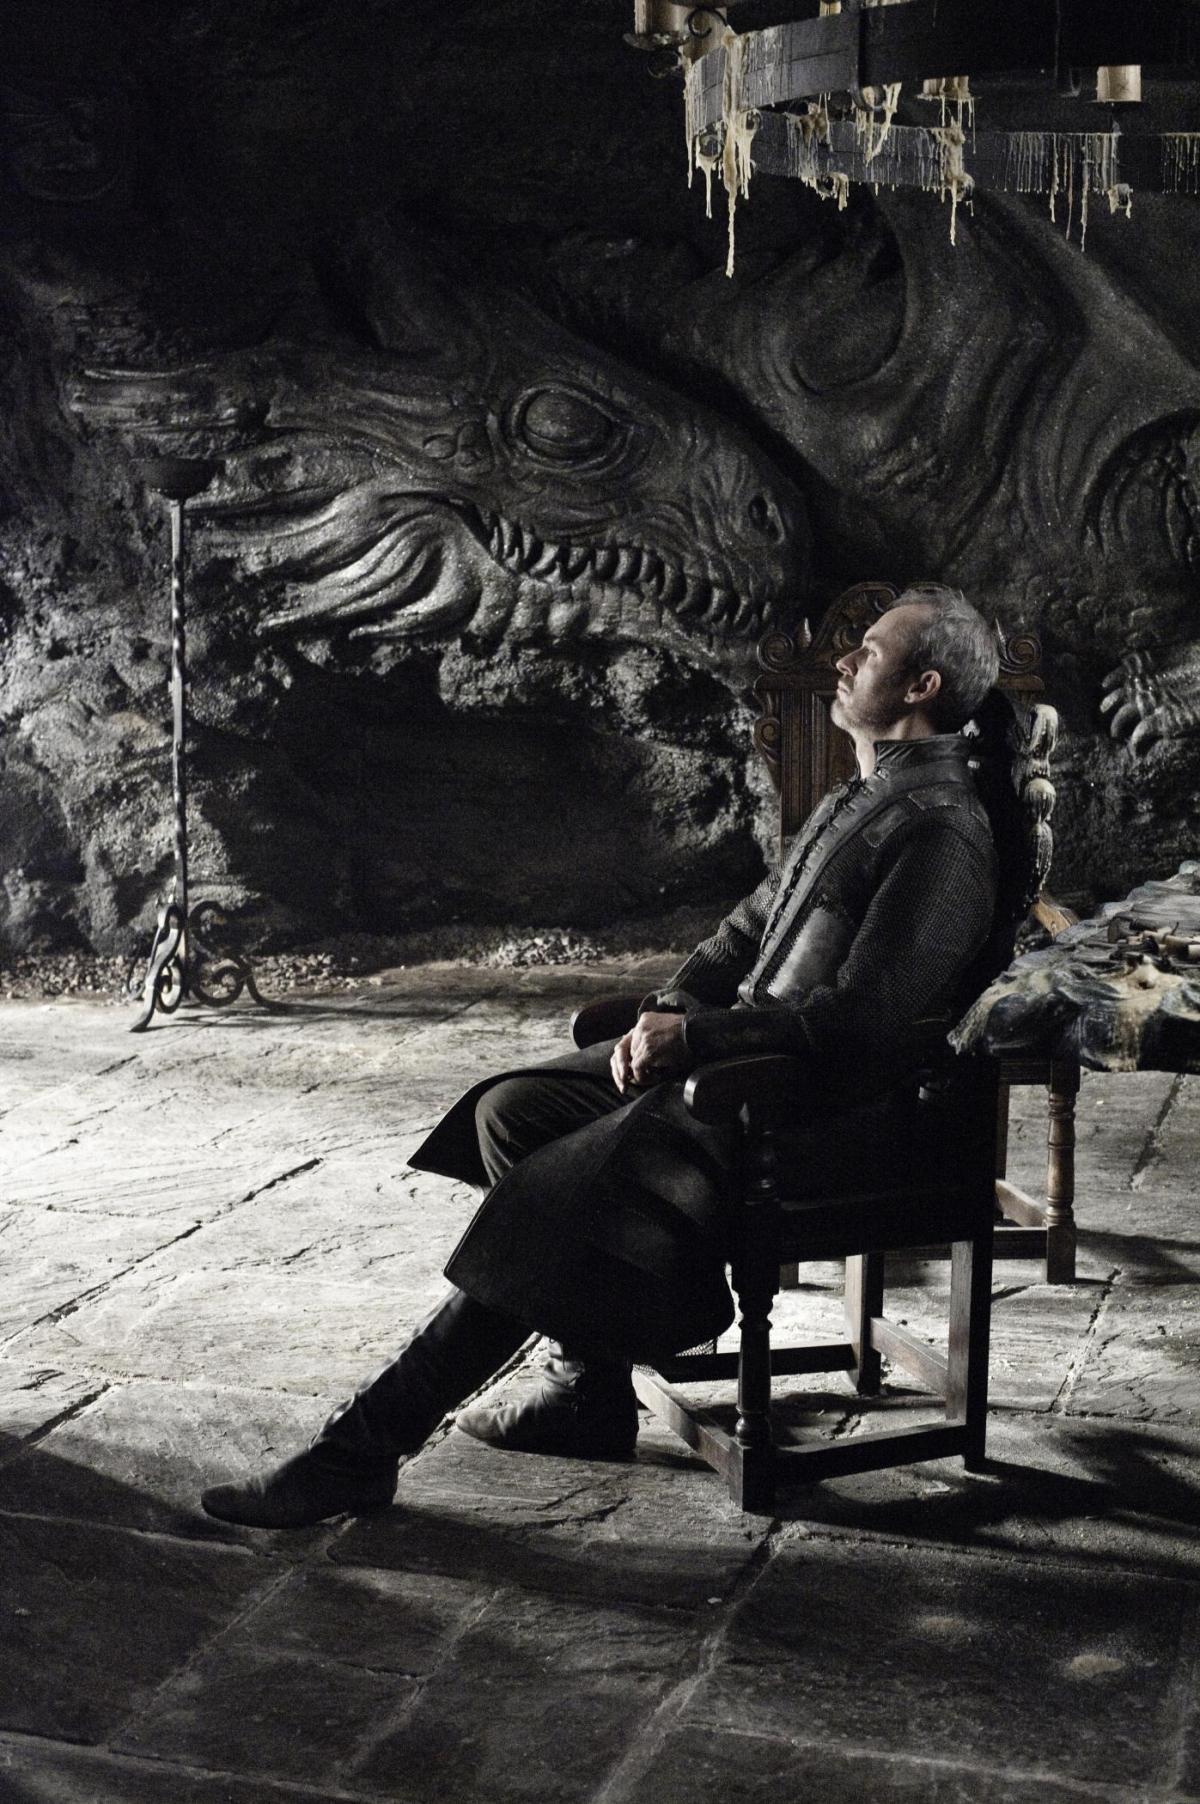 Game of Thrones Stannis Baratheon played by Stephen Dillane